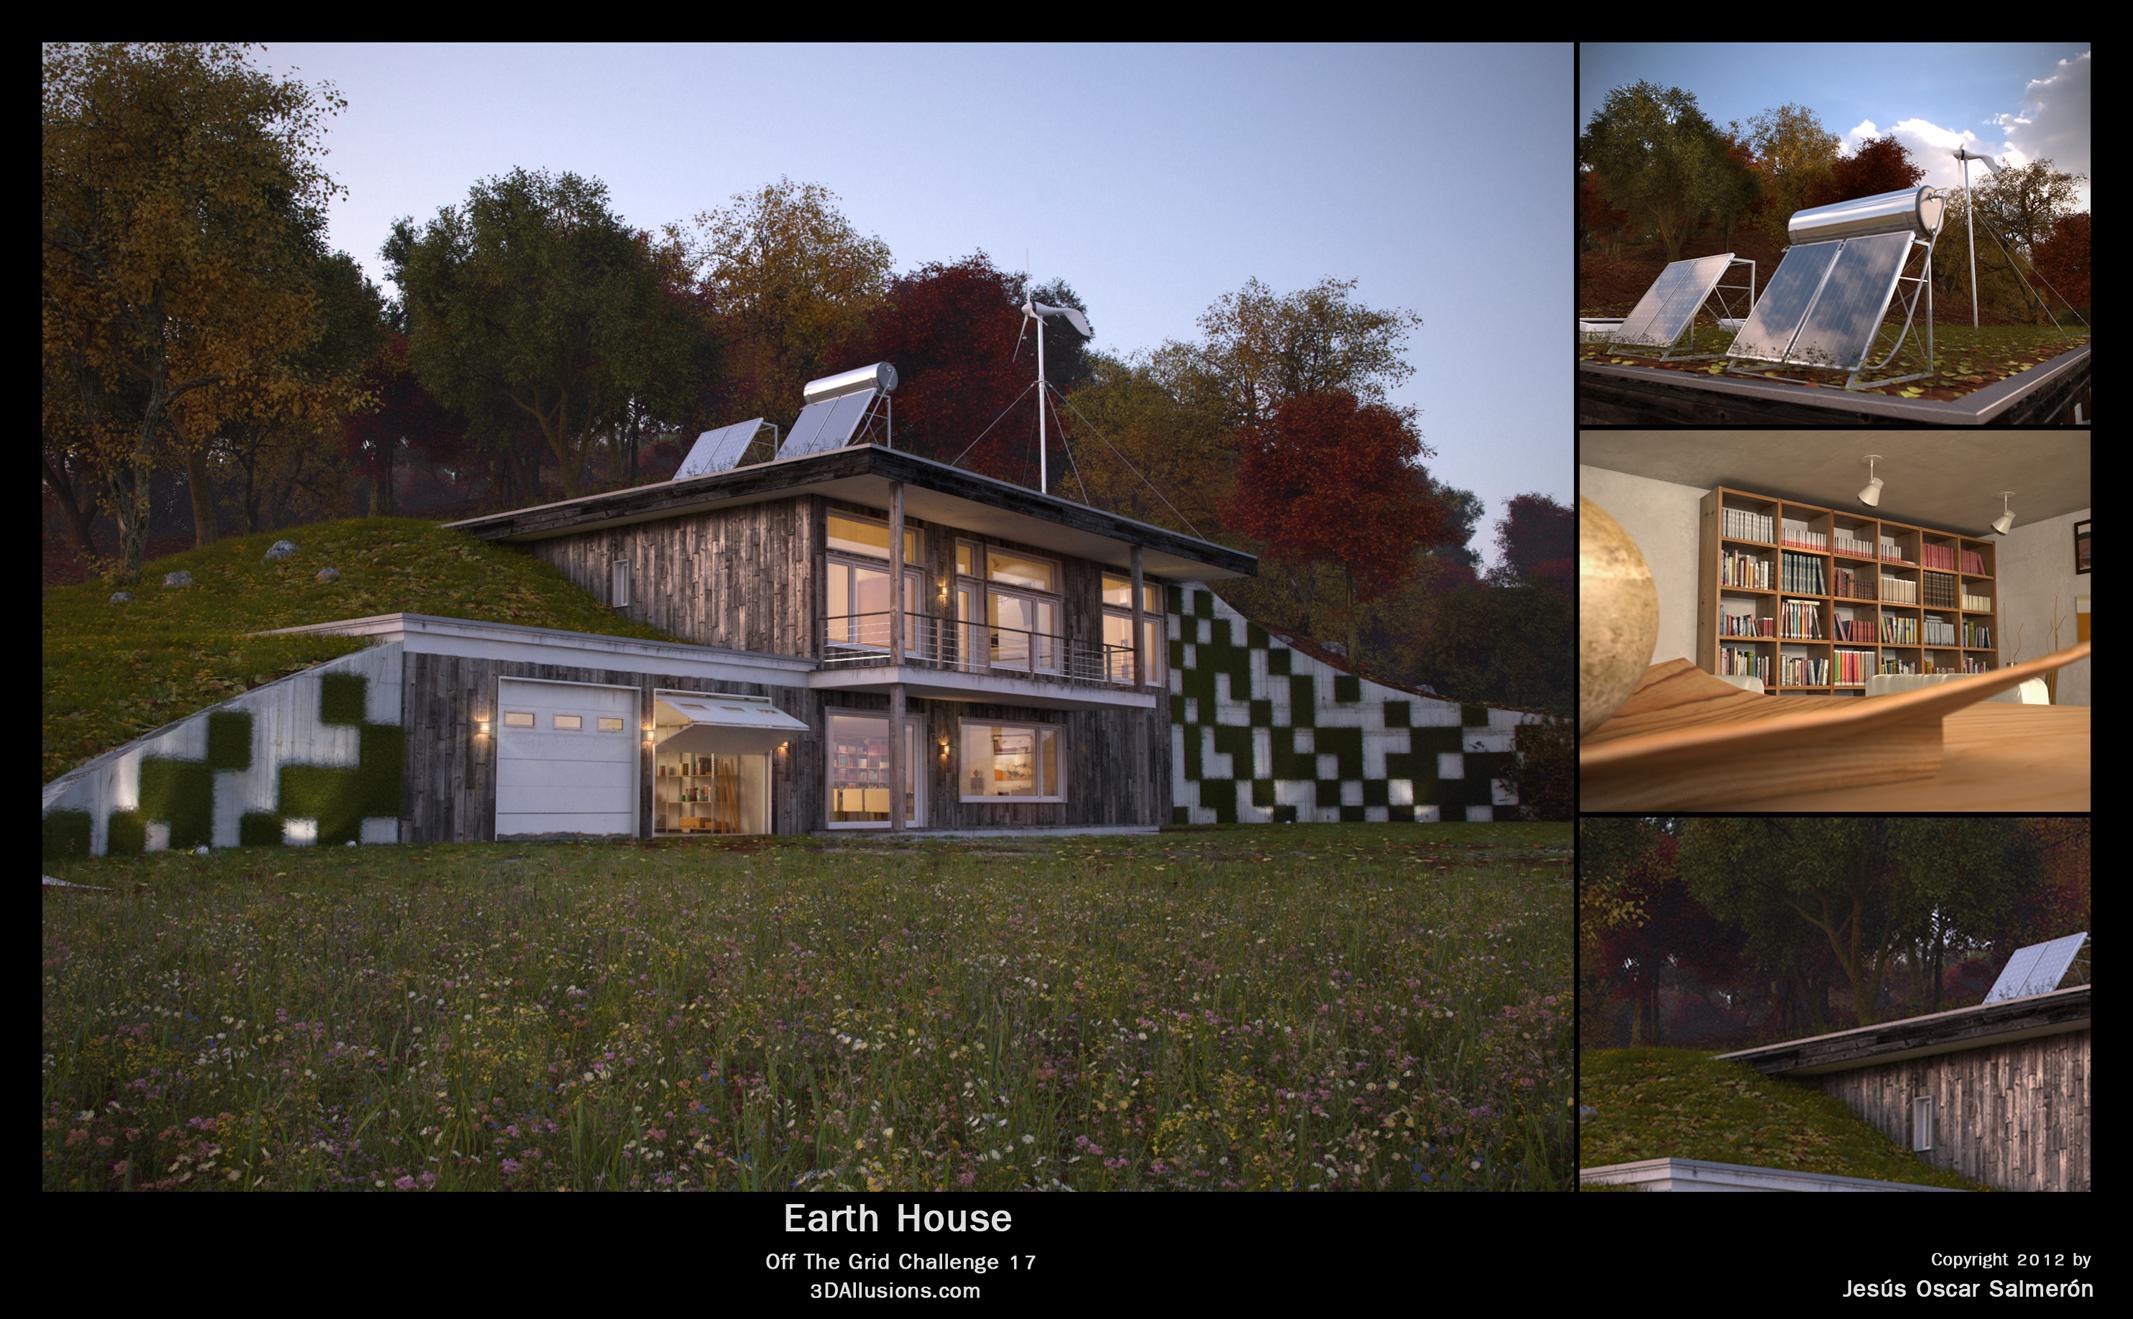 earth house house pallavincini arni switzerland home swee